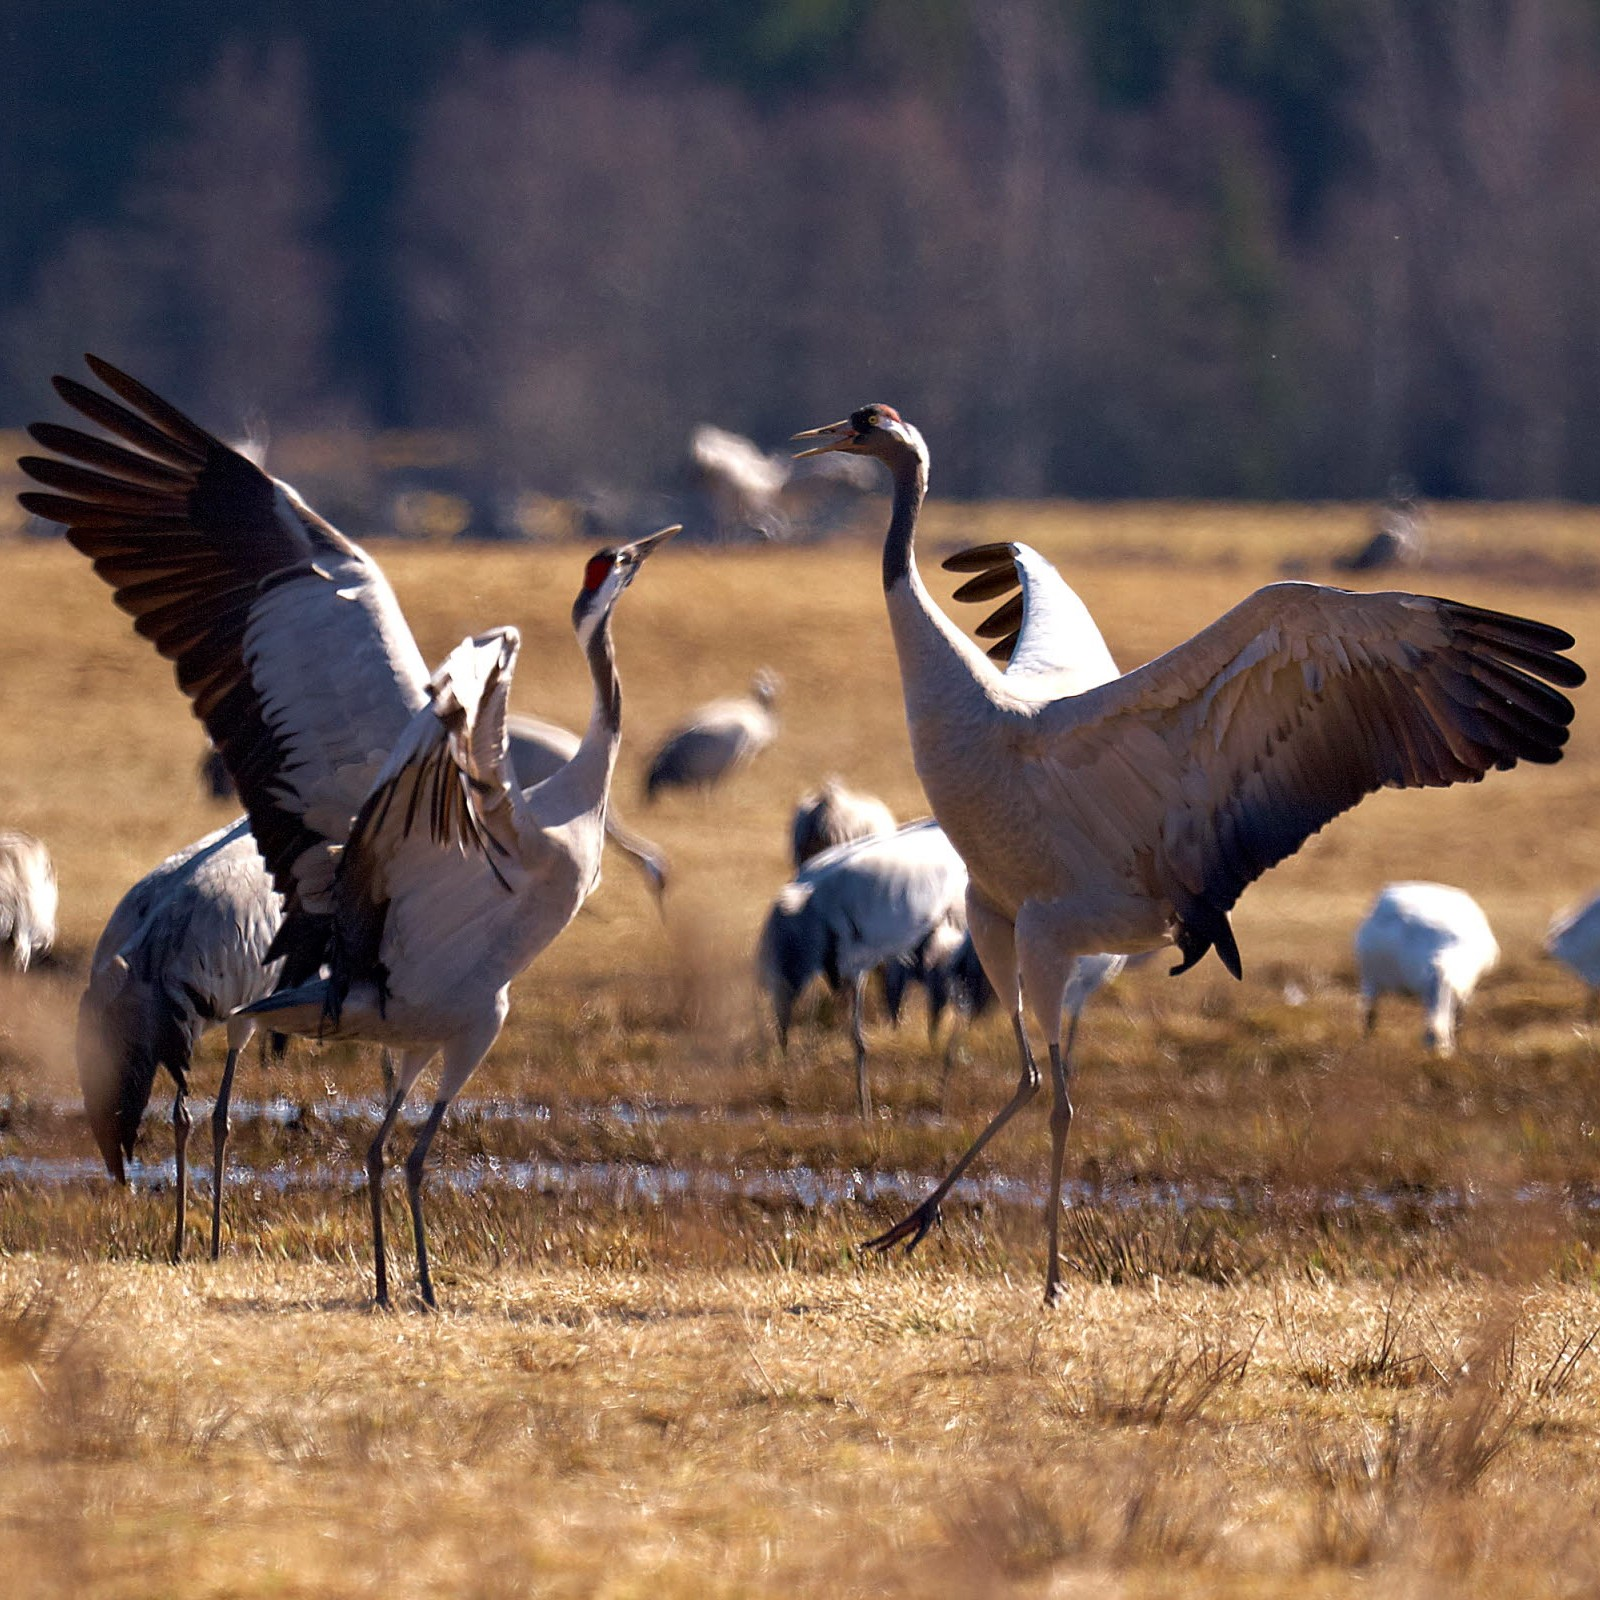 Dancing cranes - Photo Jonas Ingman